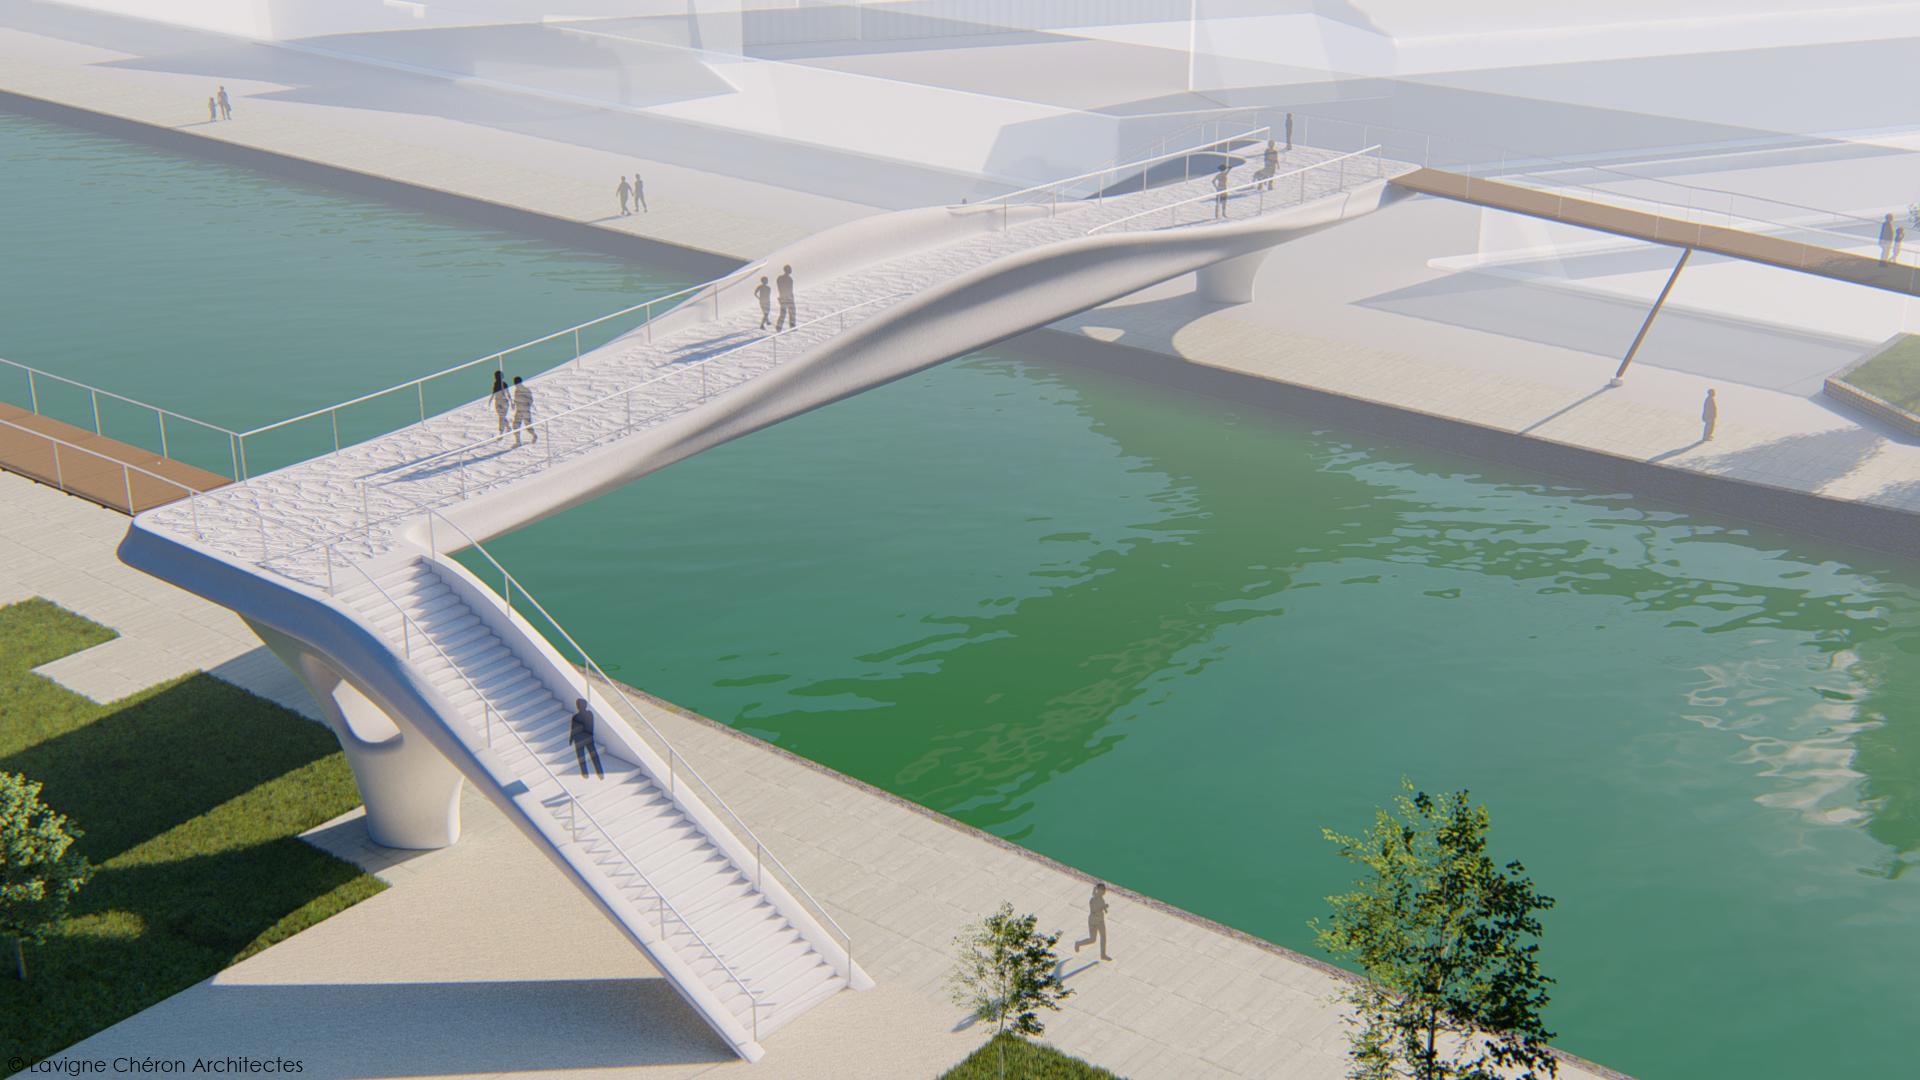 XTREEE TO 3D PRINT PEDESTRIAN BRIDGE FOR 2024 PARIS OLYMPIC GAMES